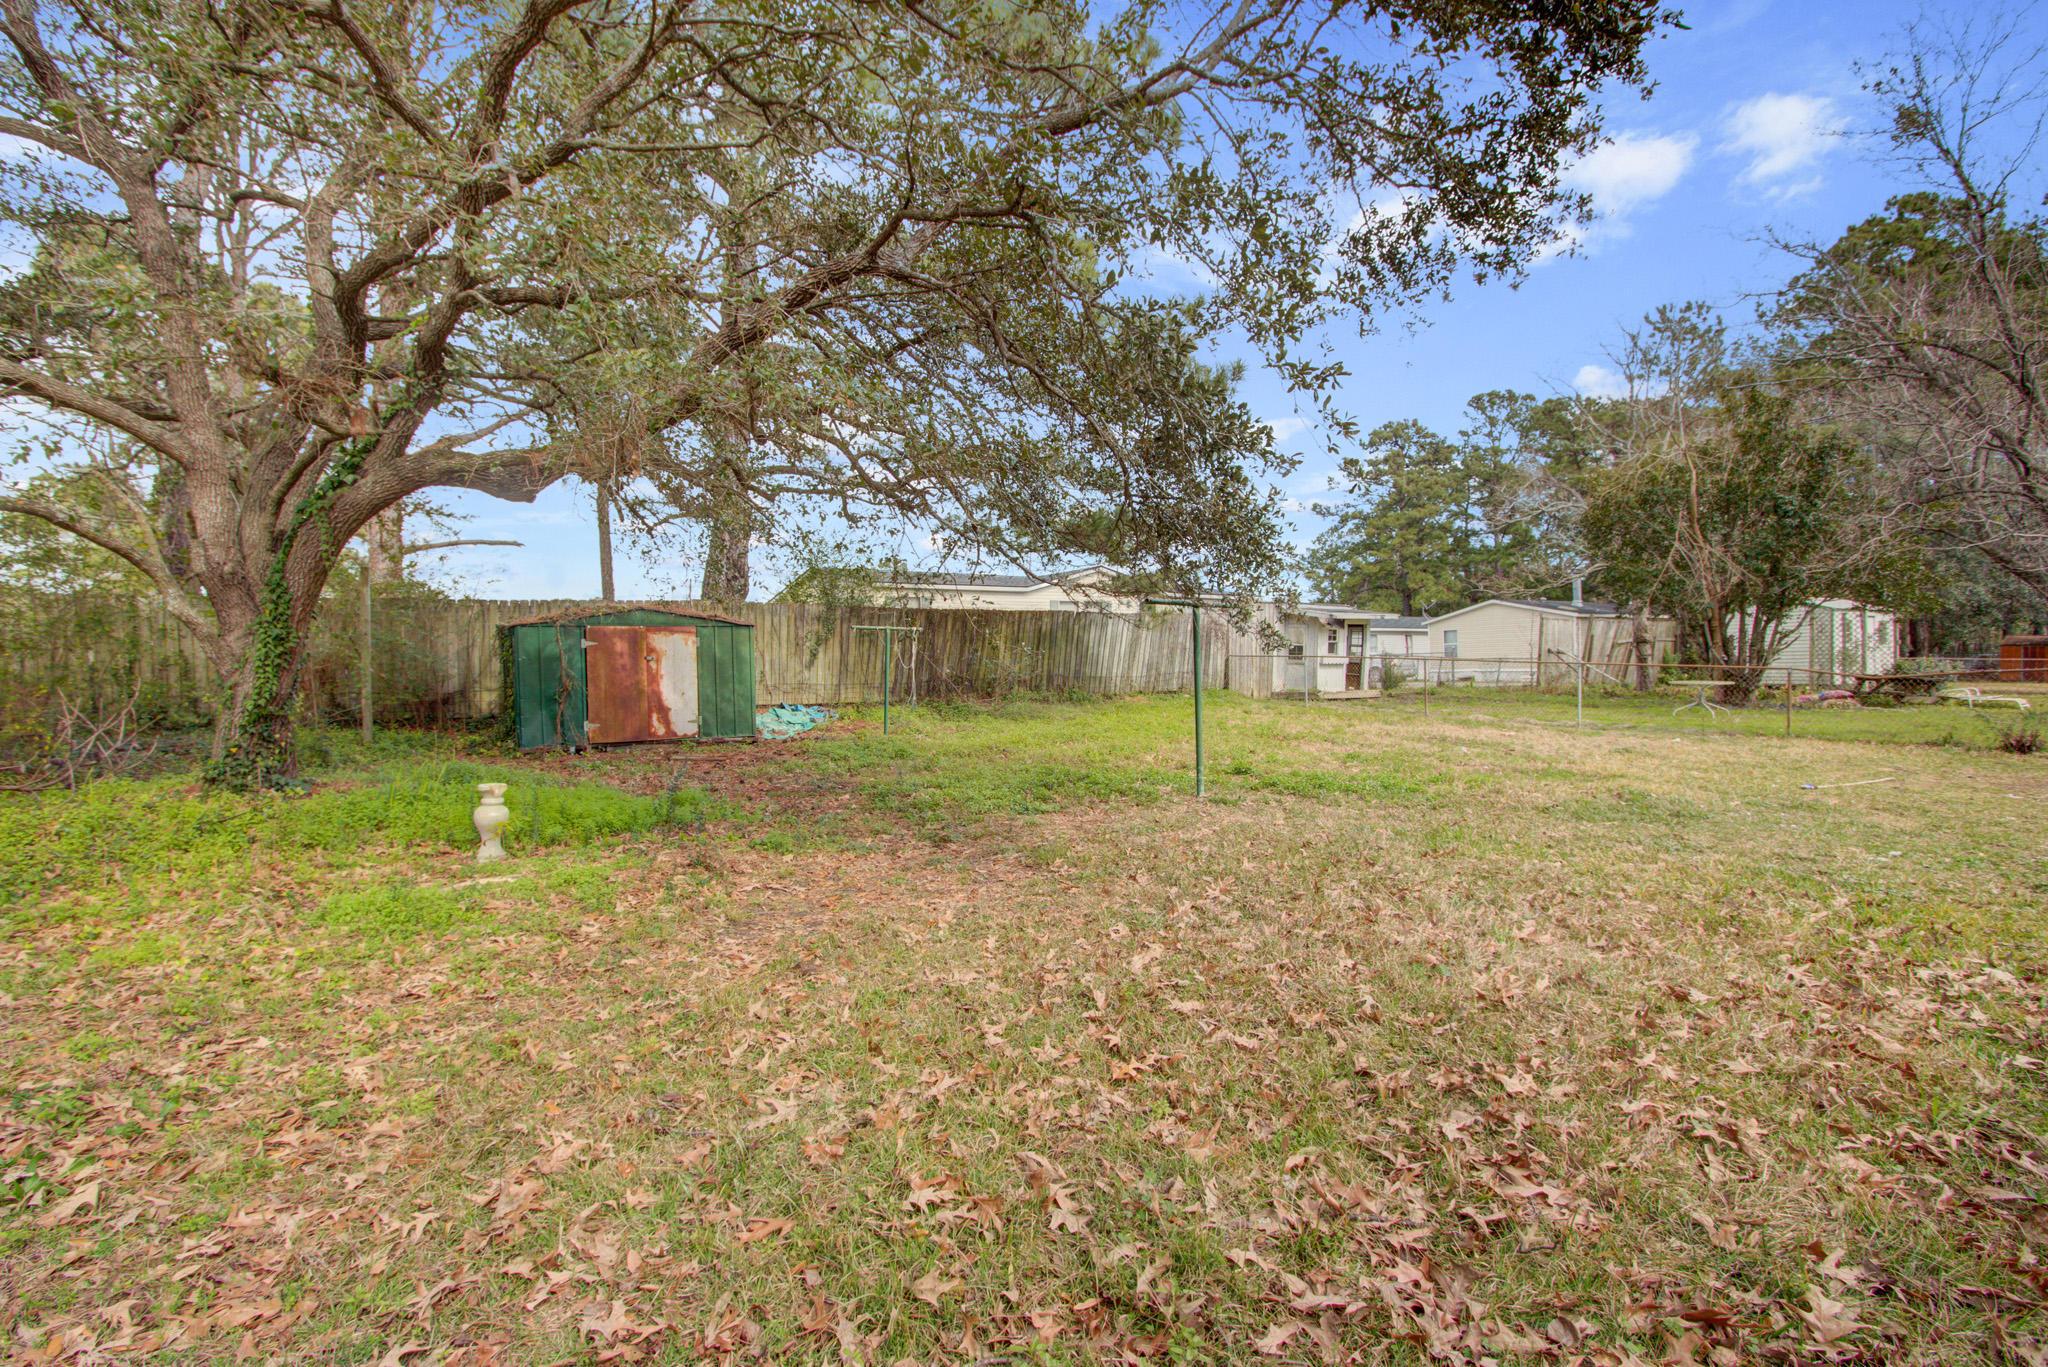 Bushy Park Terrace Homes For Sale - 125 Azalea, Goose Creek, SC - 21